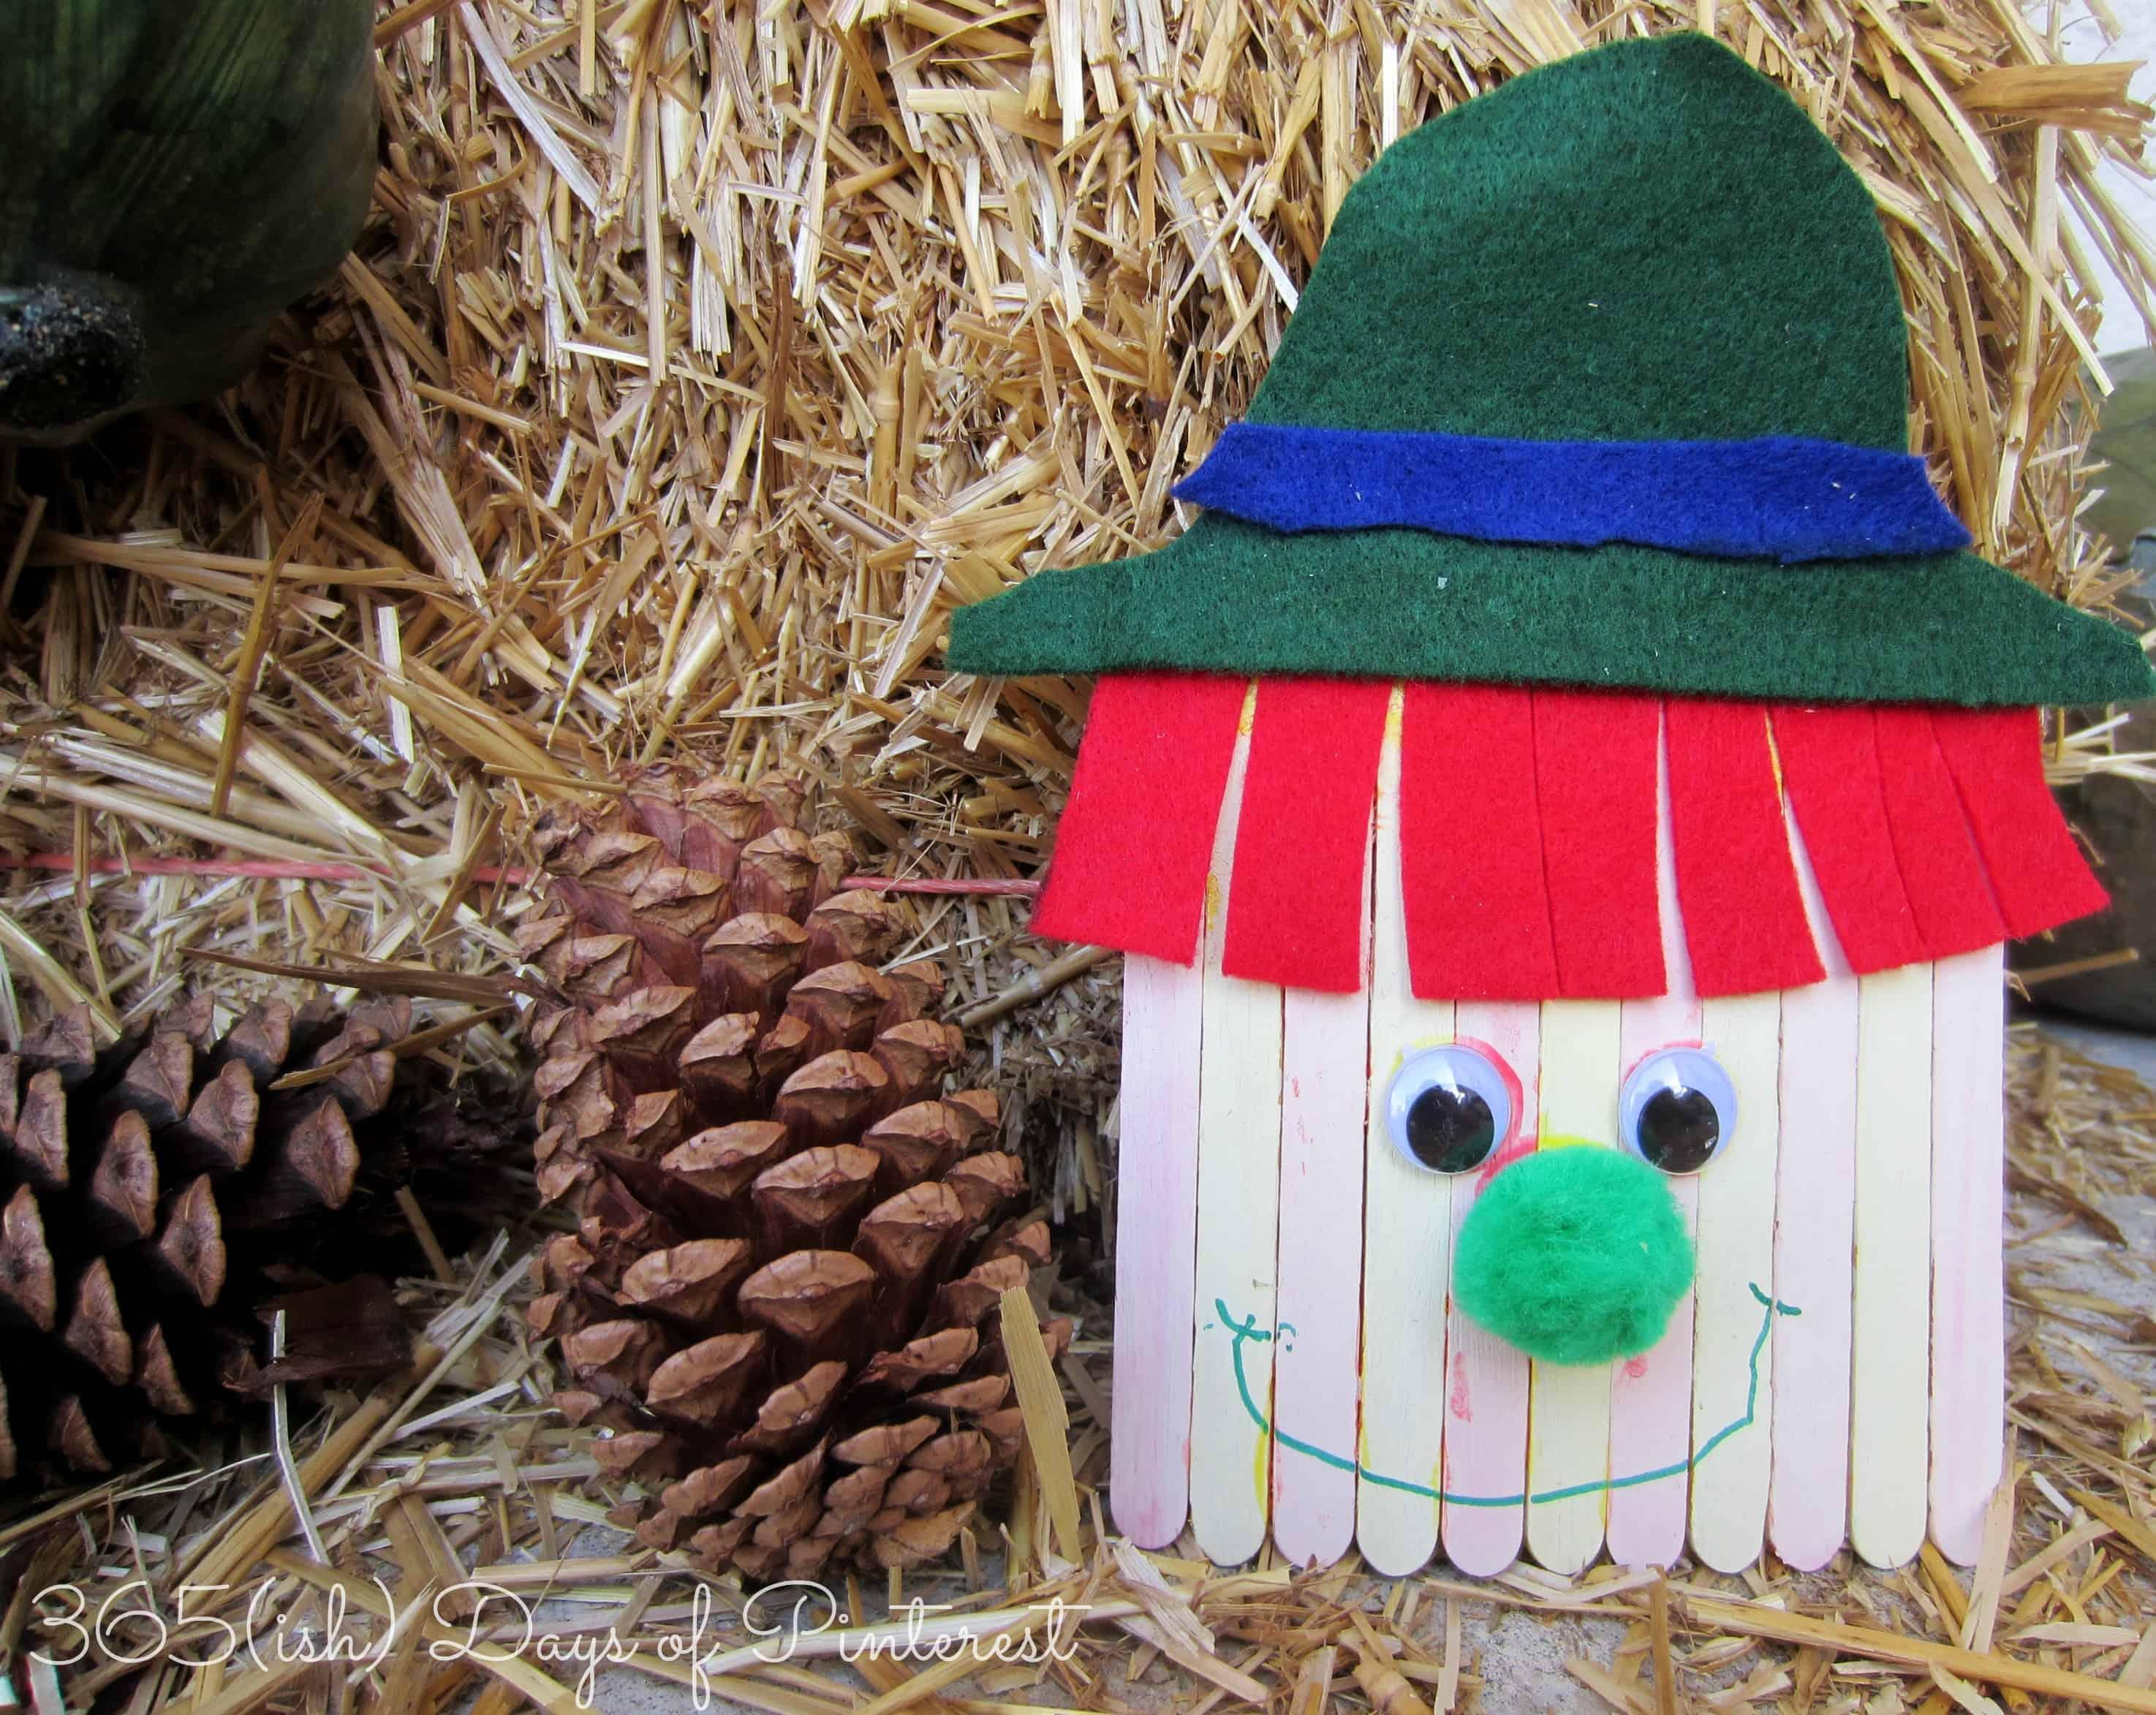 Craftstick Scarecrow Craft: Vol. 2, Day 28